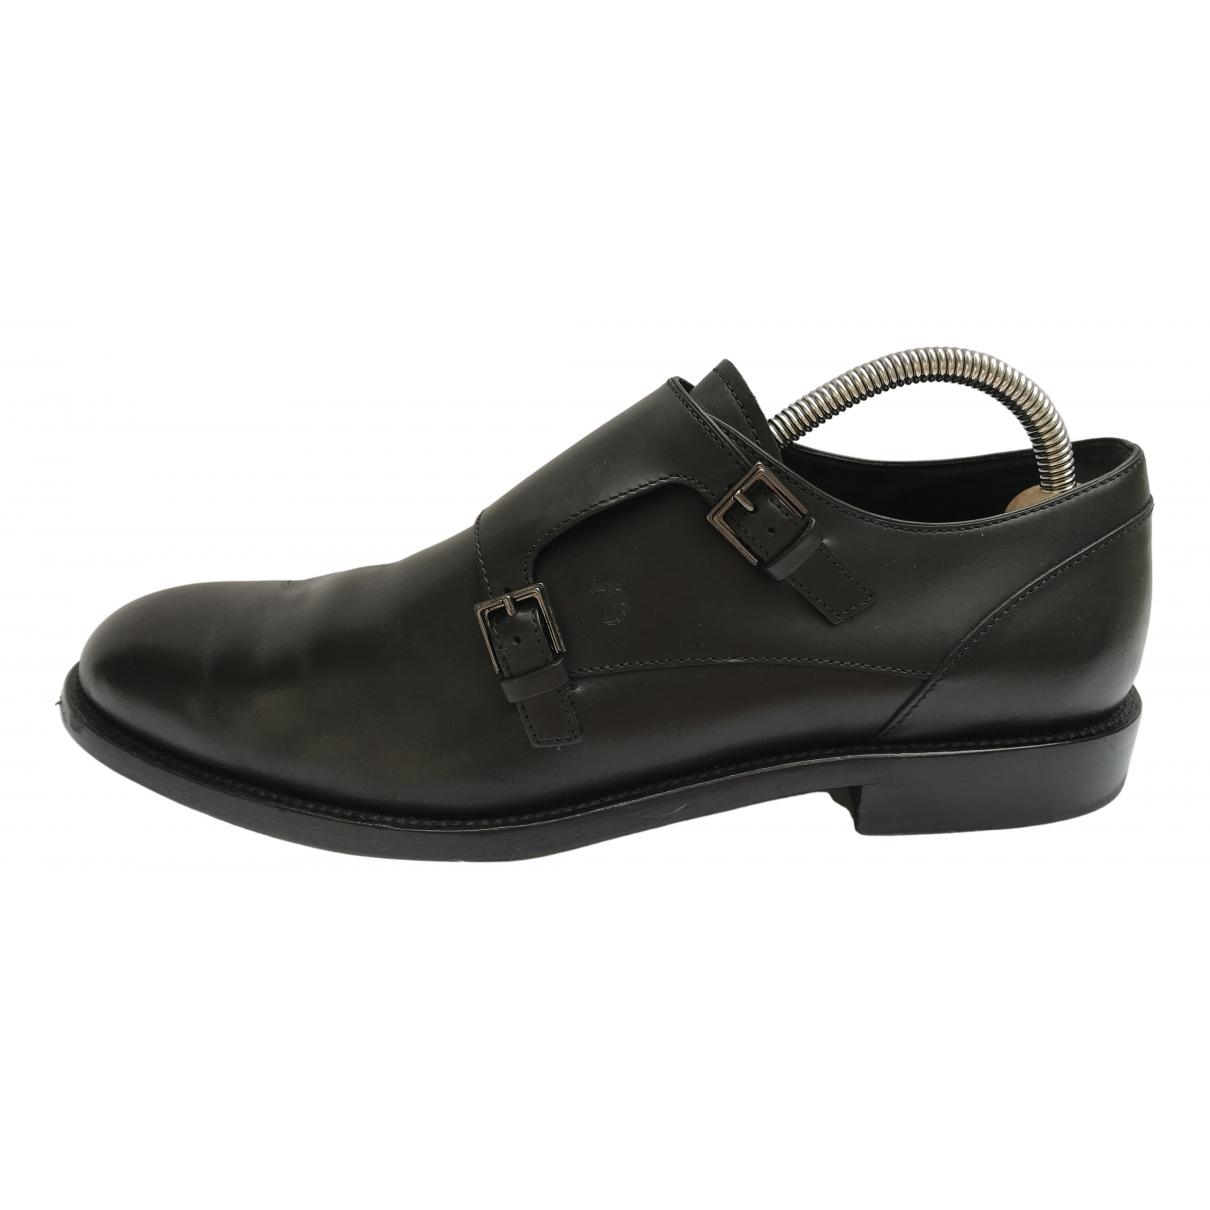 Tod's N Black Leather Flats for Men 9.5 UK